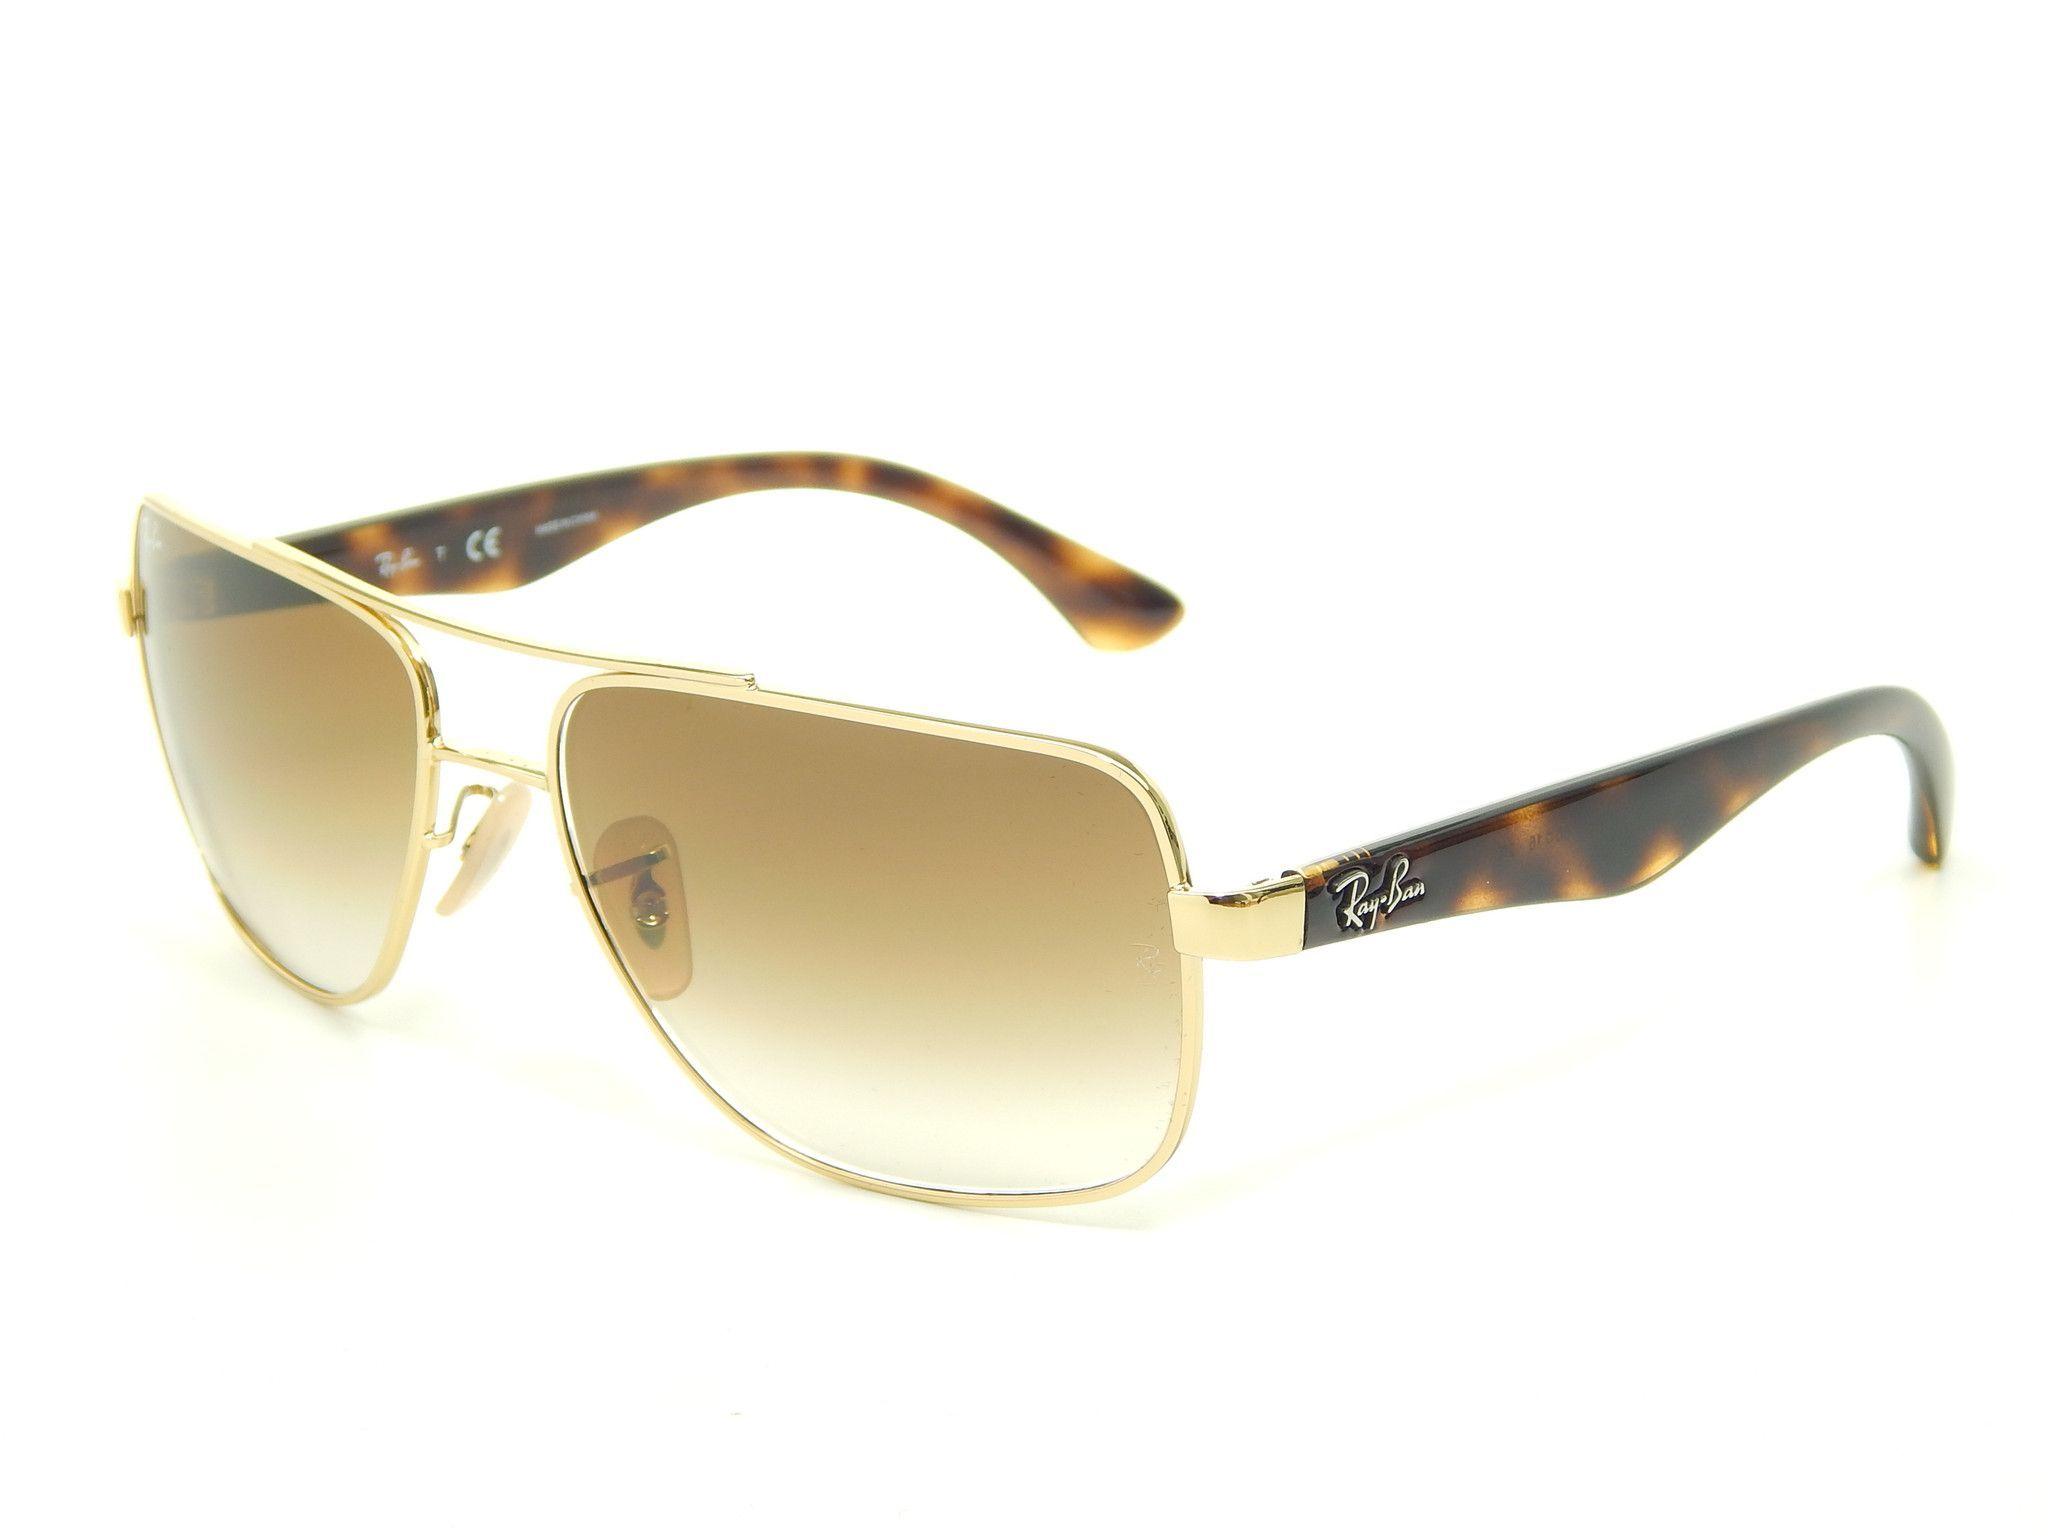 1e17882c4c Ray Ban RB3483 001 51 Gold Light Brown Gradient 60mm Sunglasses ...